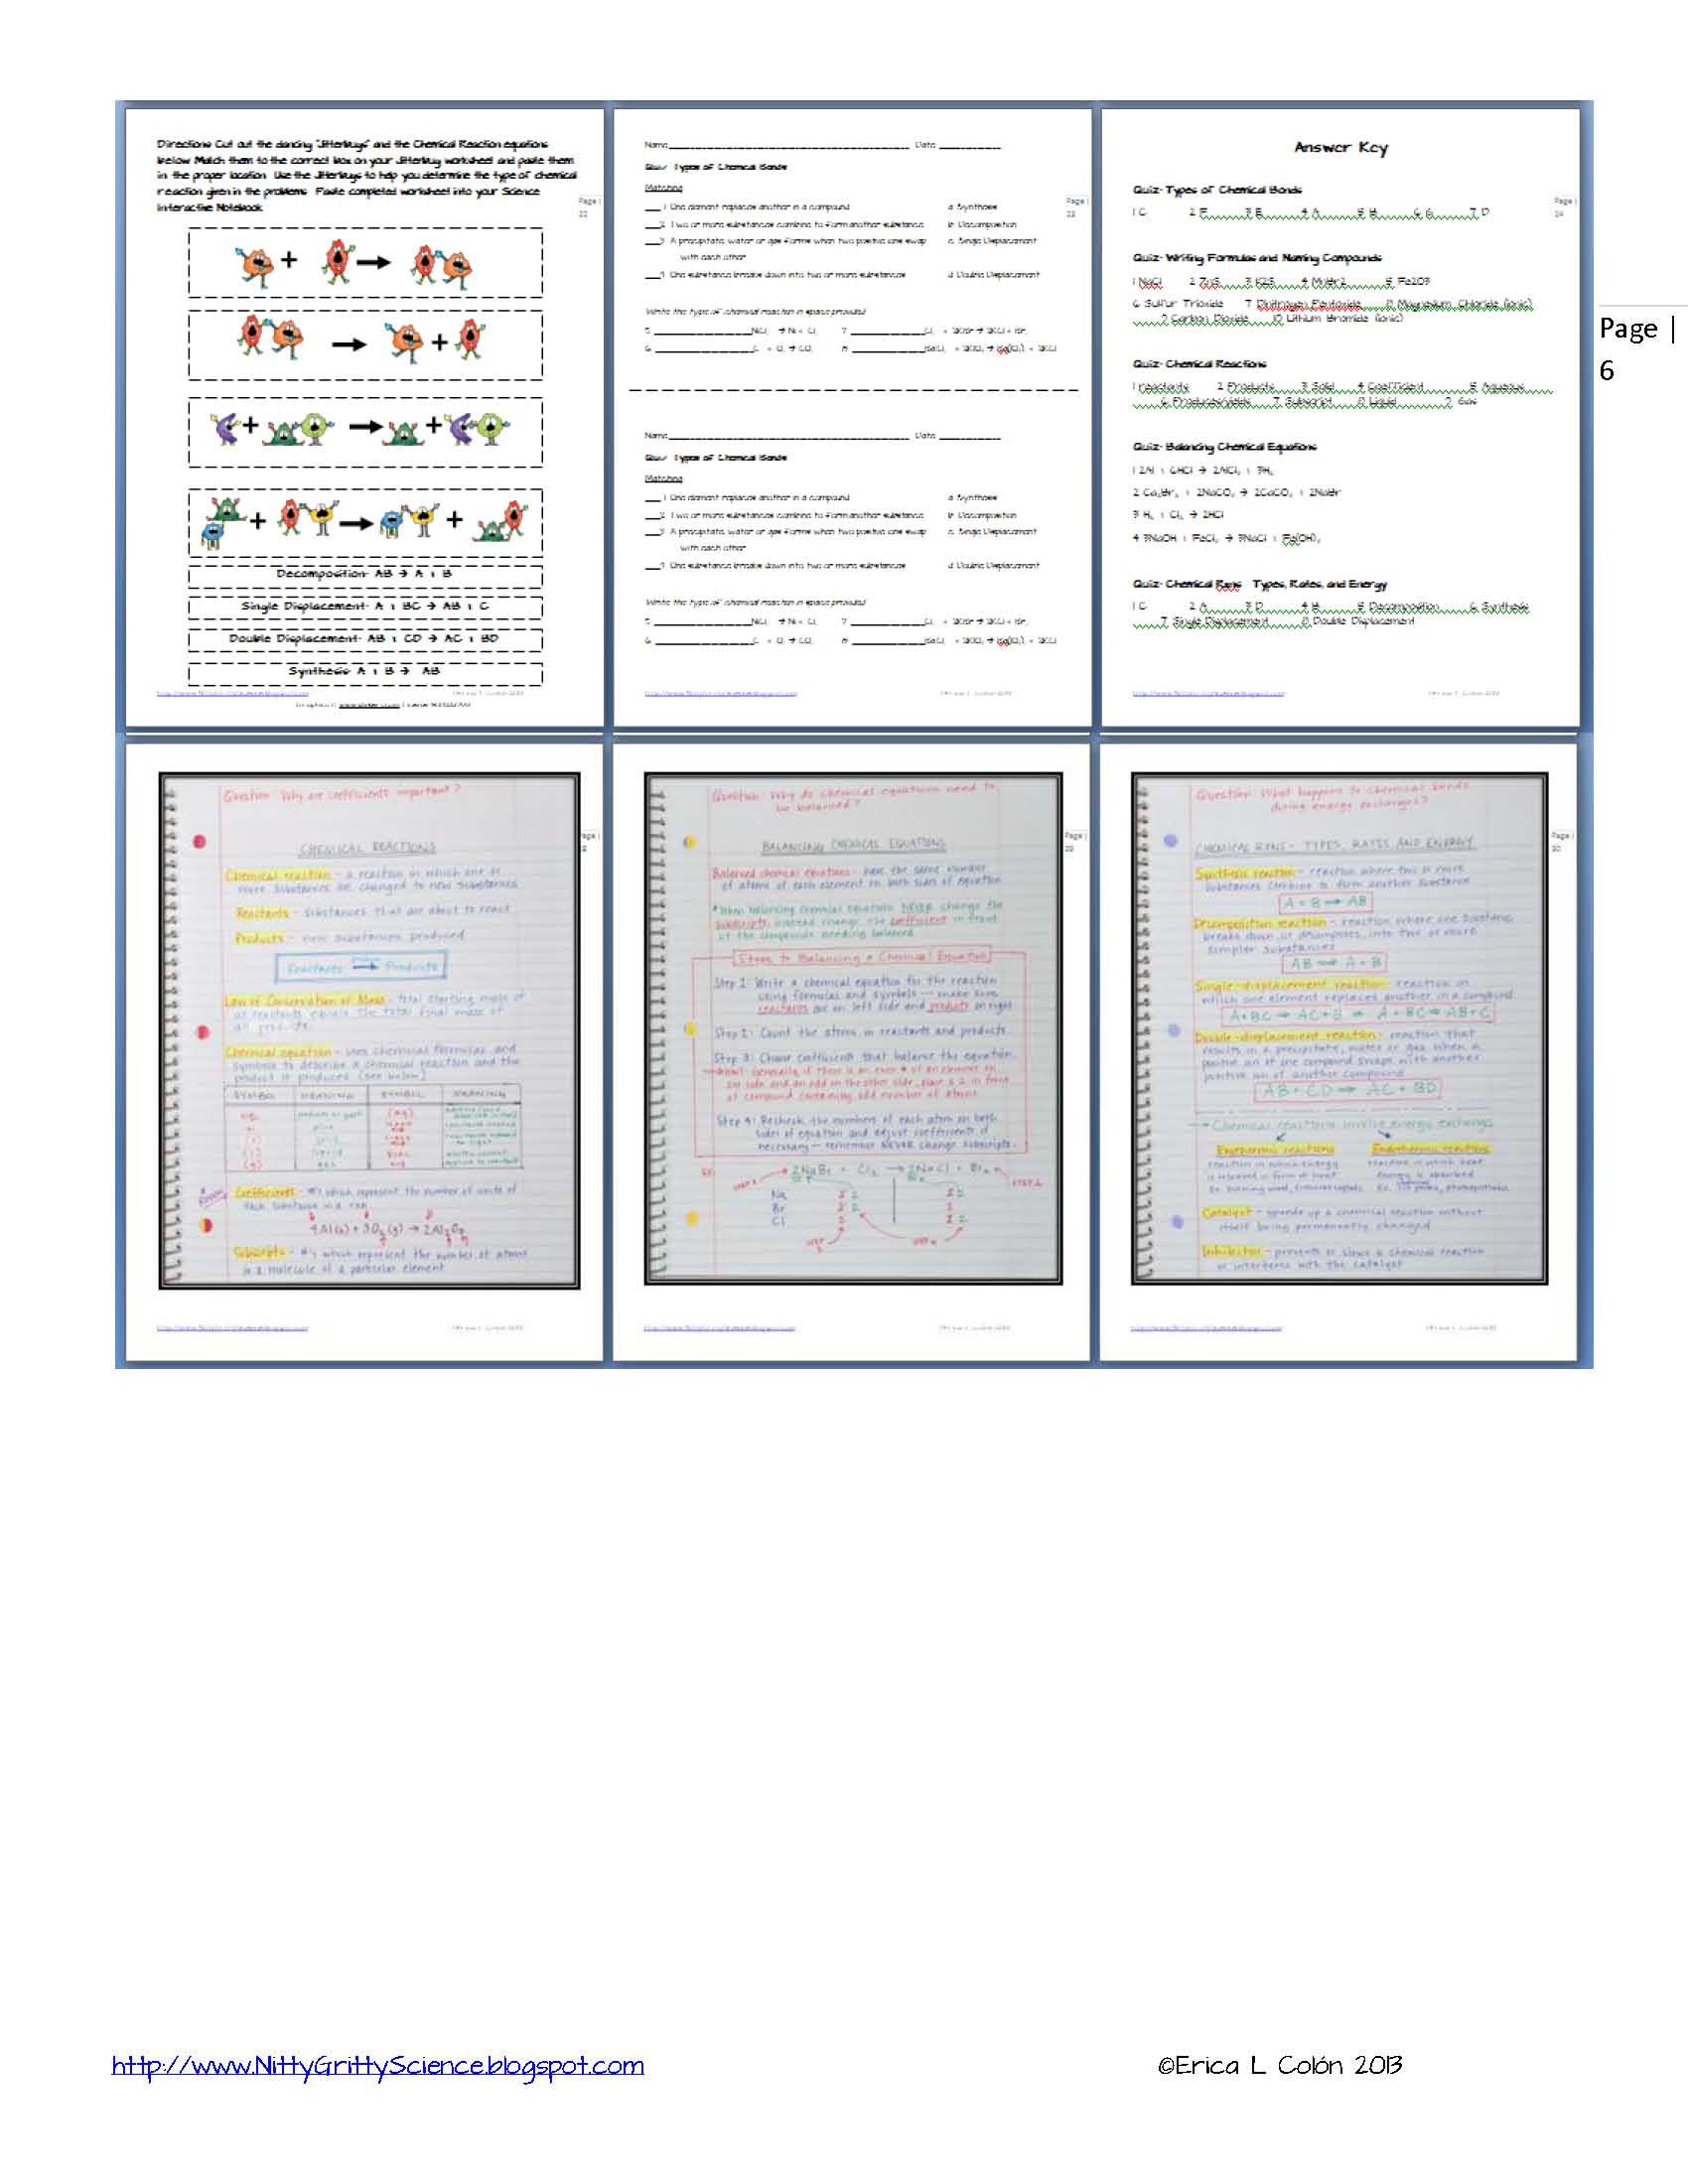 Balancing Equations Online Worksheet Answer Key